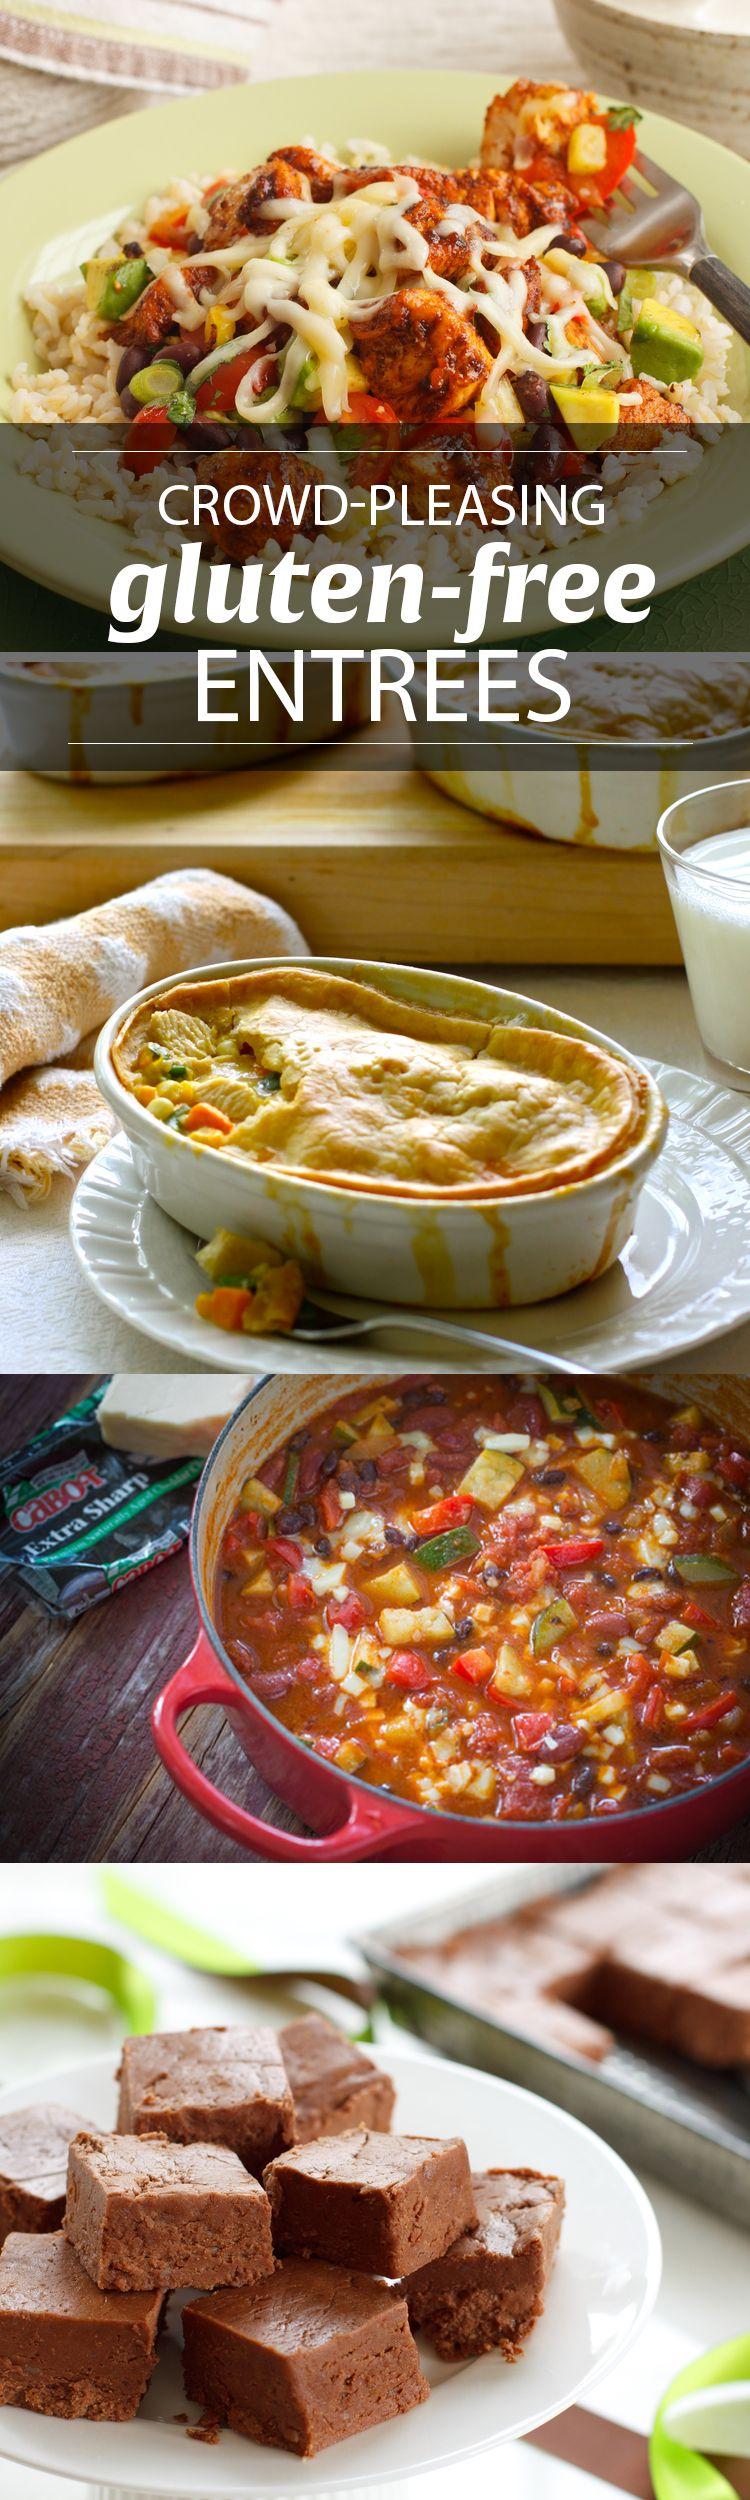 Crowdpleasing glutenfree entrees cabot creamery food